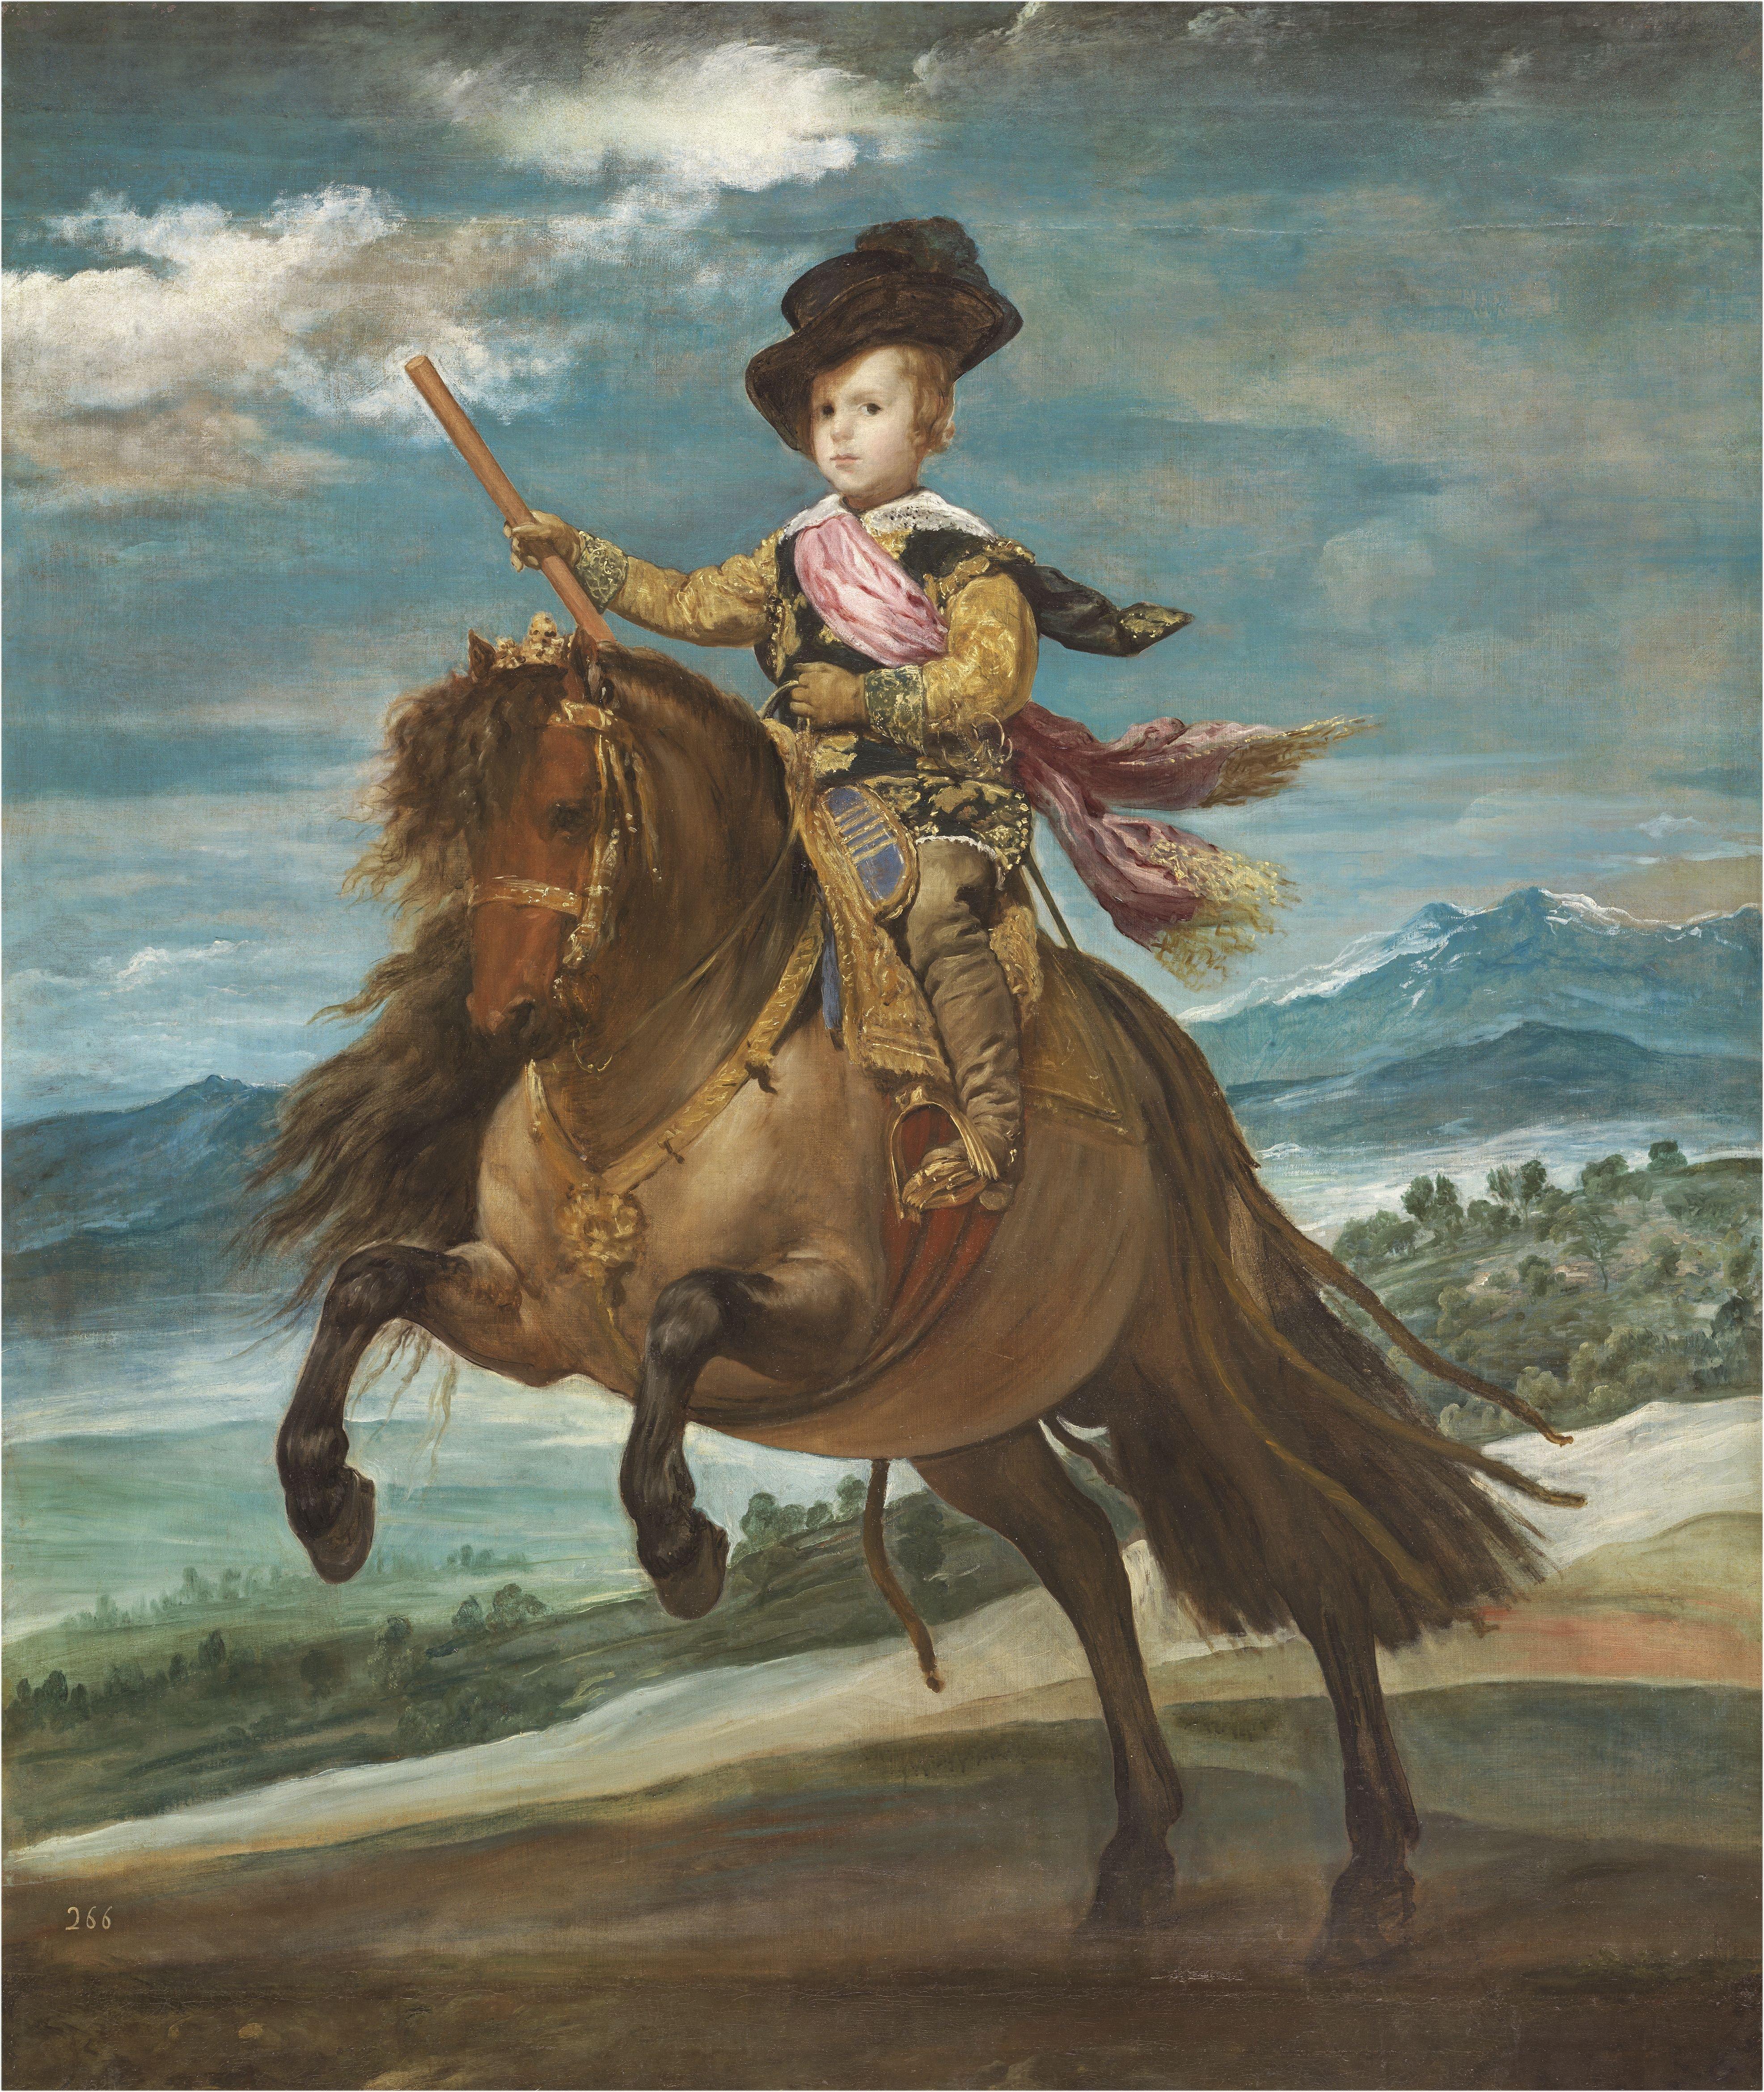 diego velazquez i el princep baltasar carles a cavall i 1634 1635 madrid museo nacional del prado